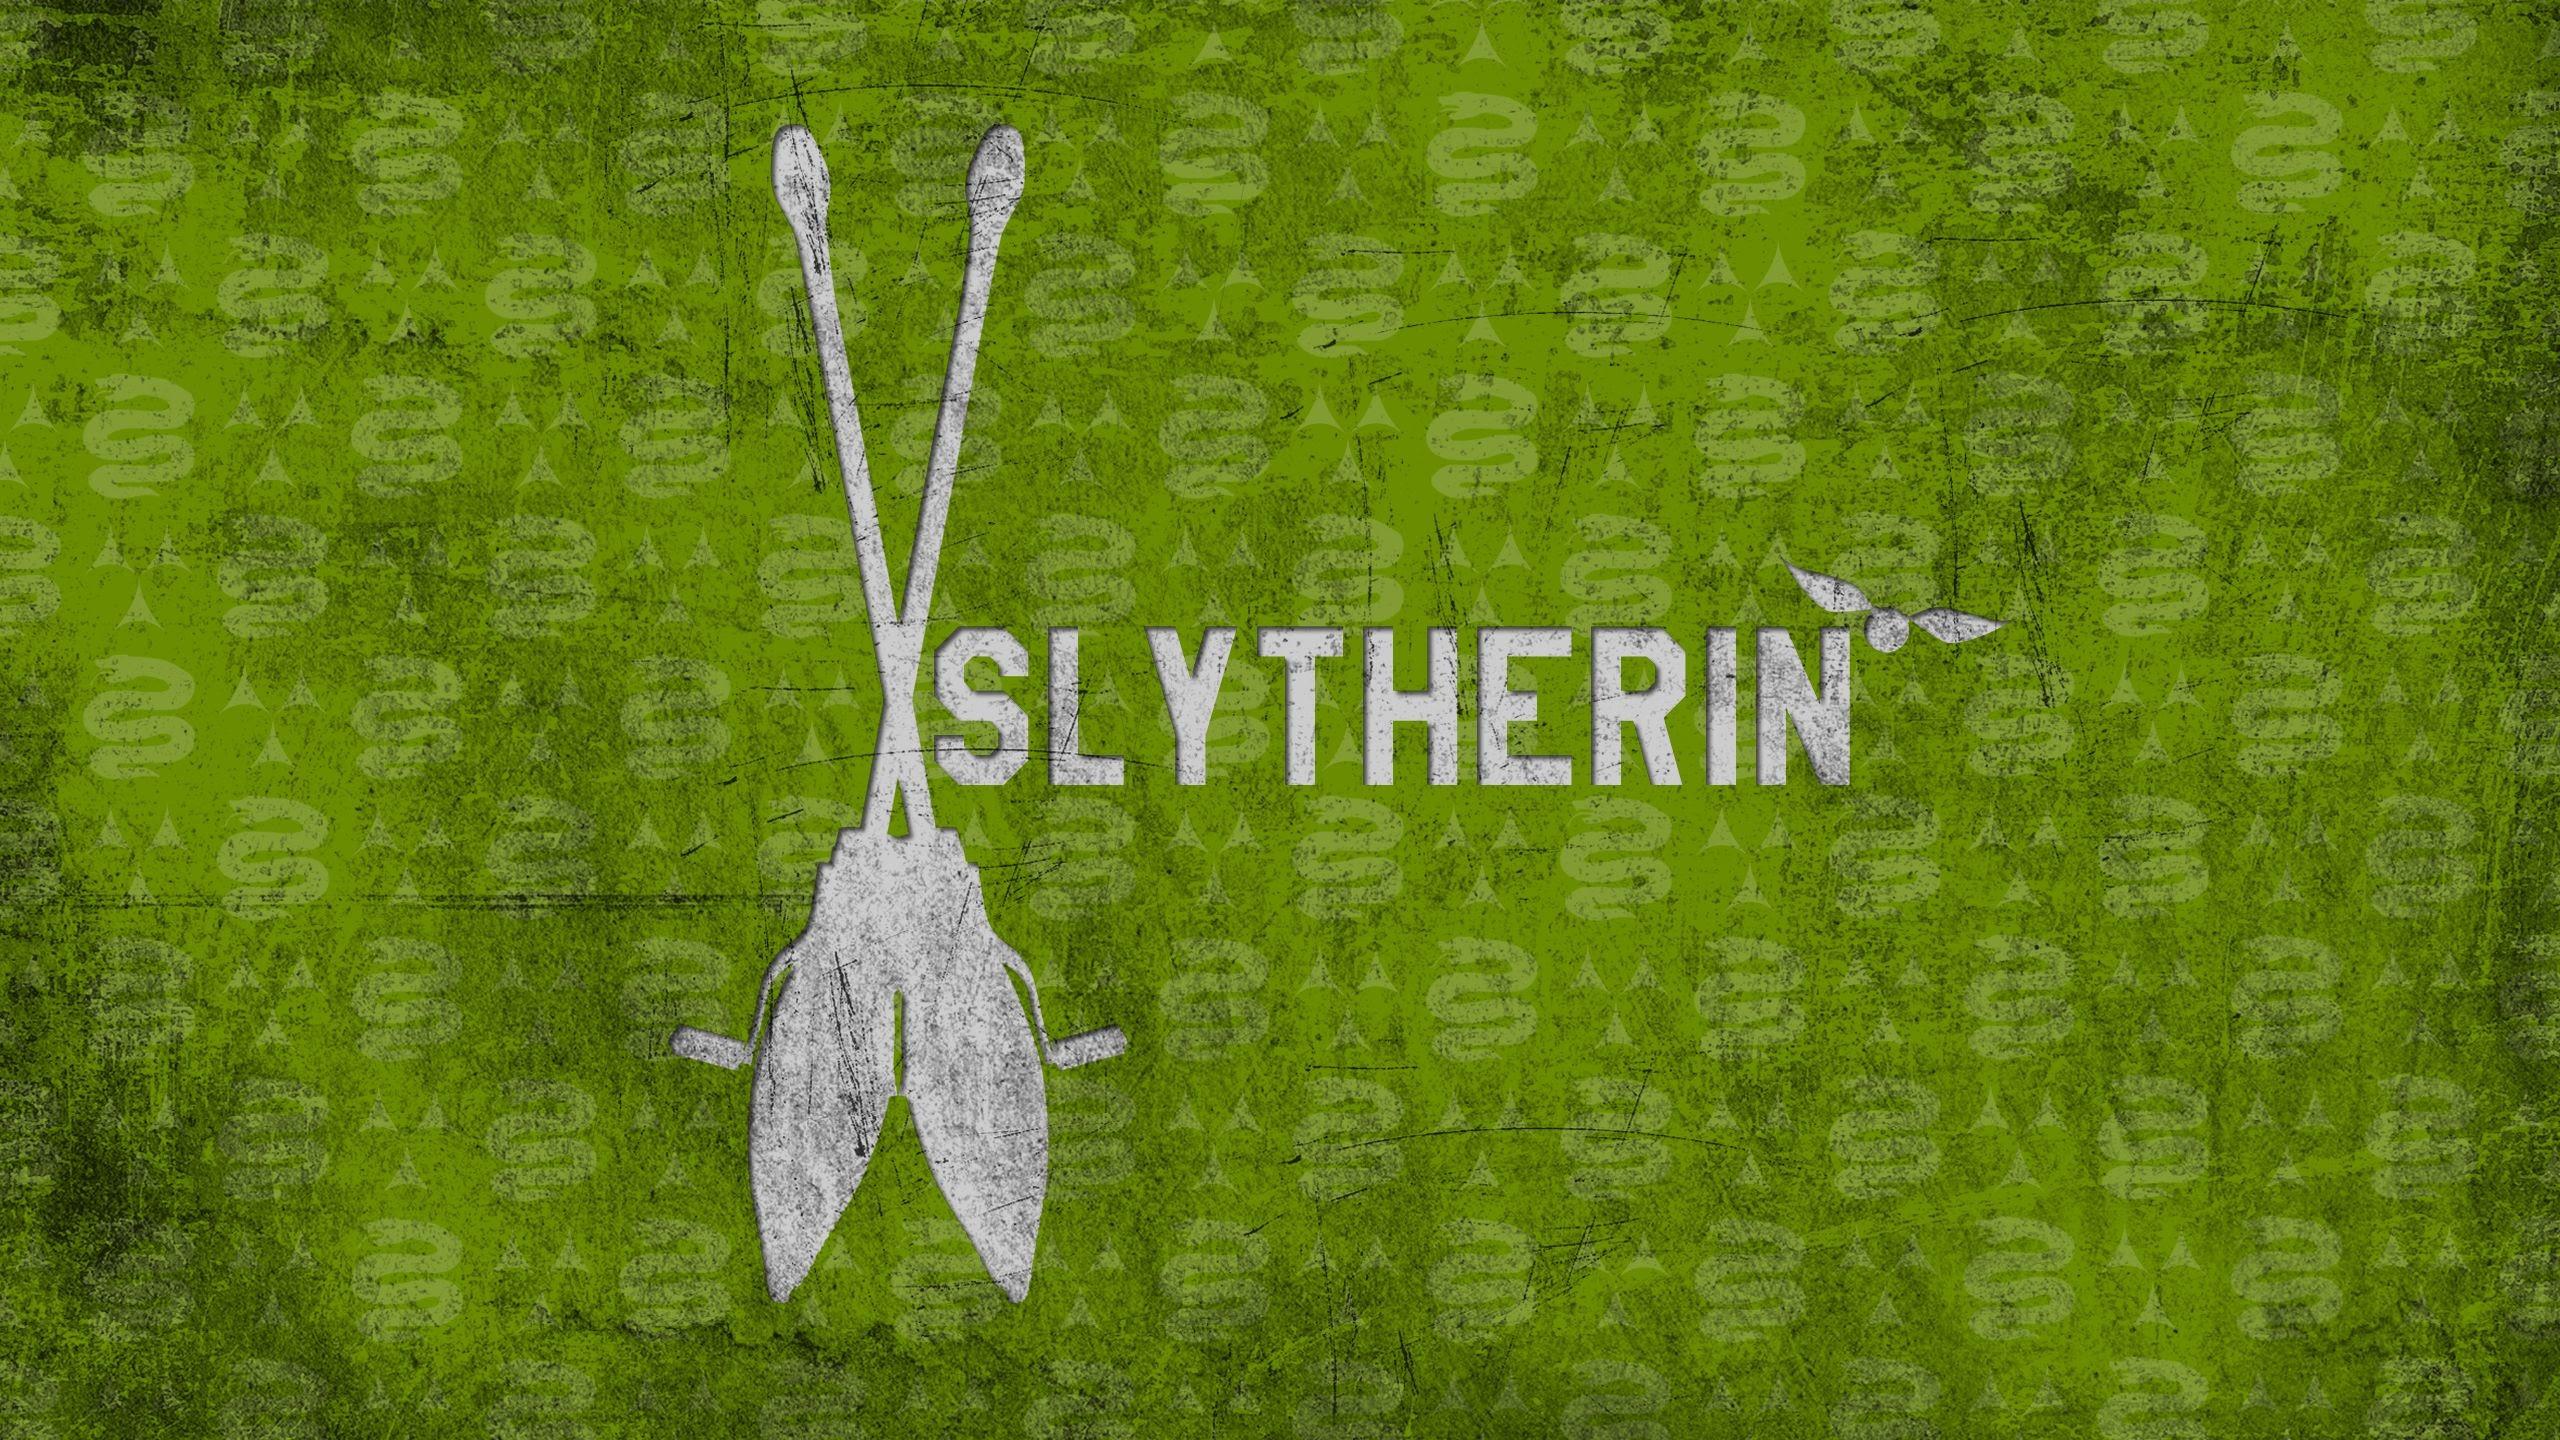 Aesthetic Harry Potter Wallpaper Slytherin Wallpaper Hd New